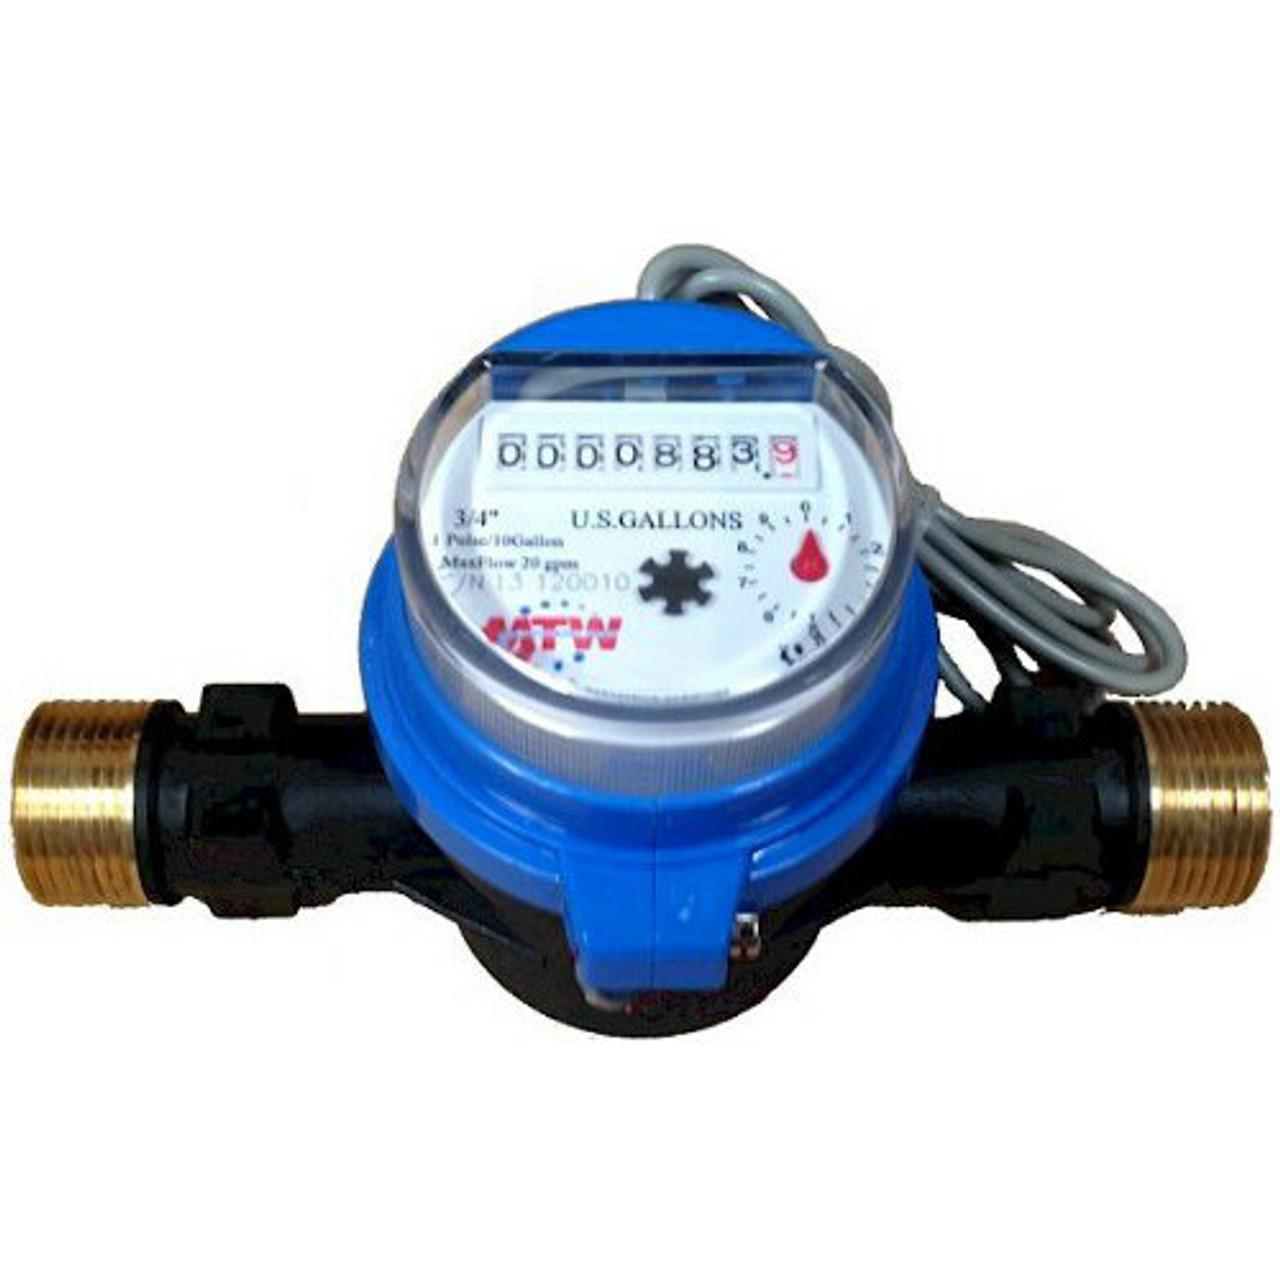 Cold Water Meters